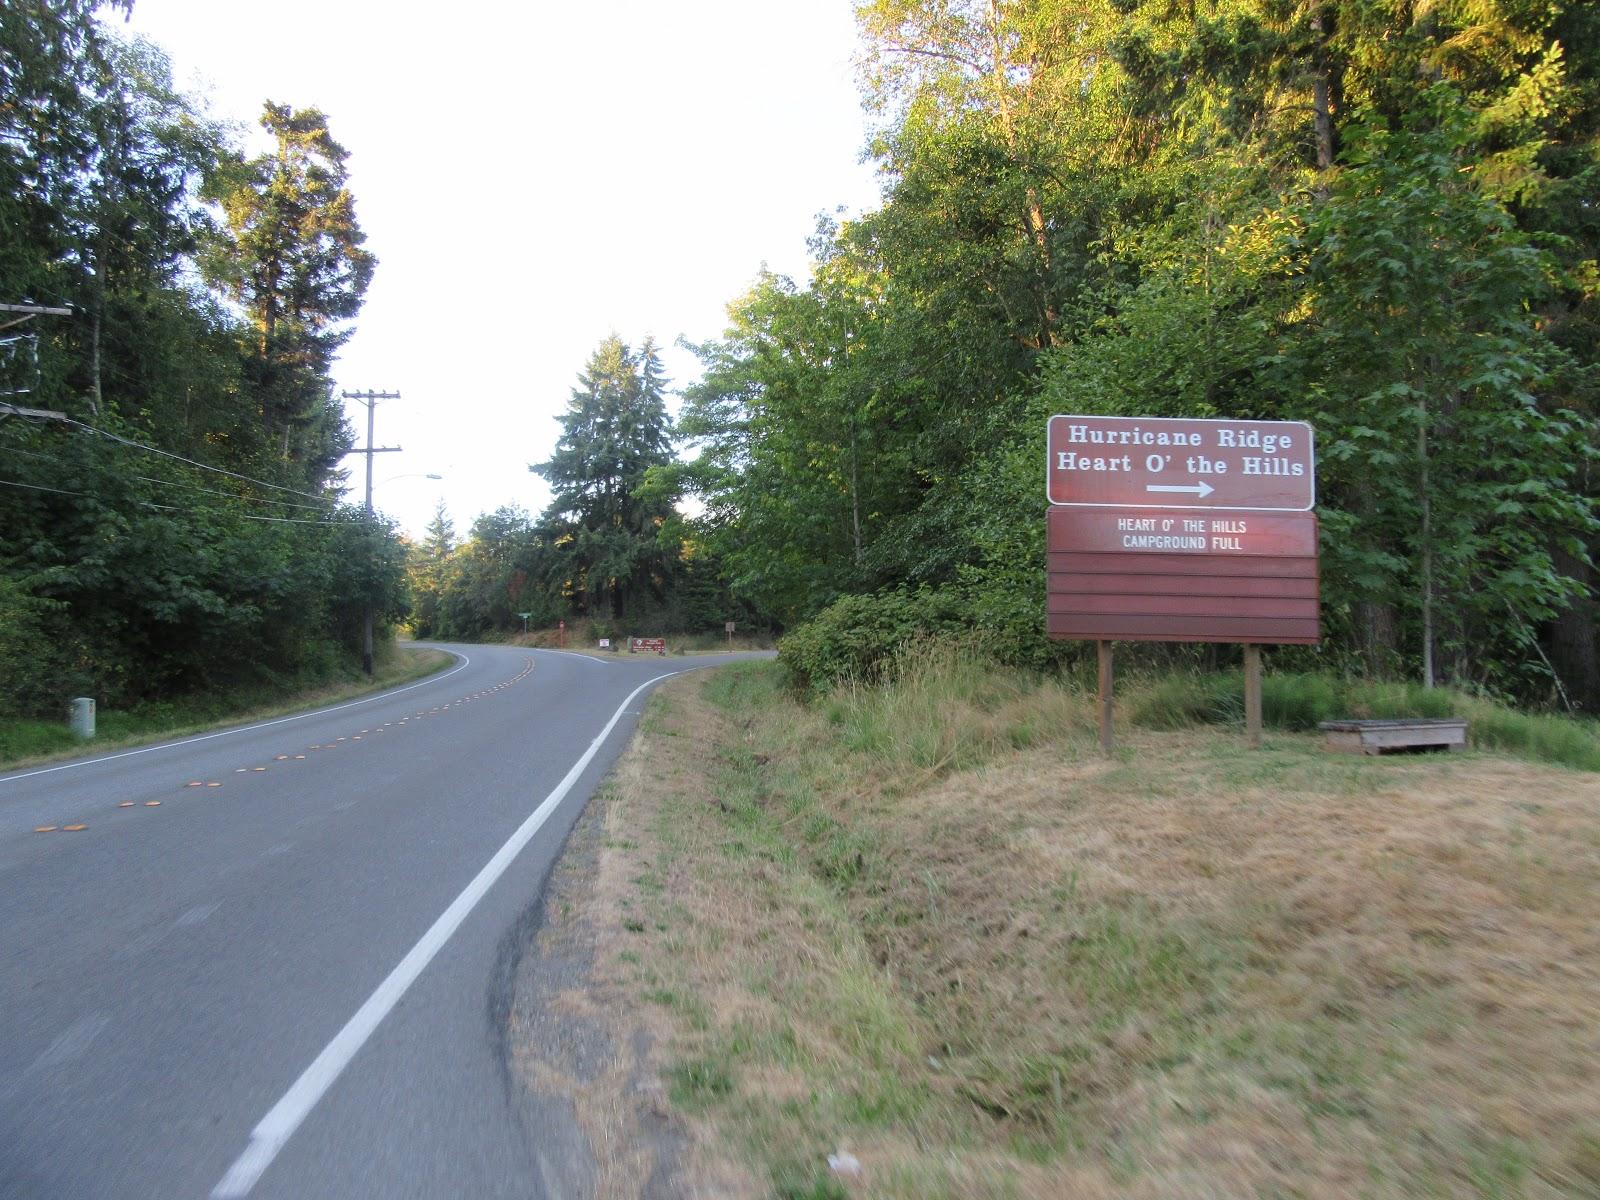 Road sign directing to Hurricane Ridge